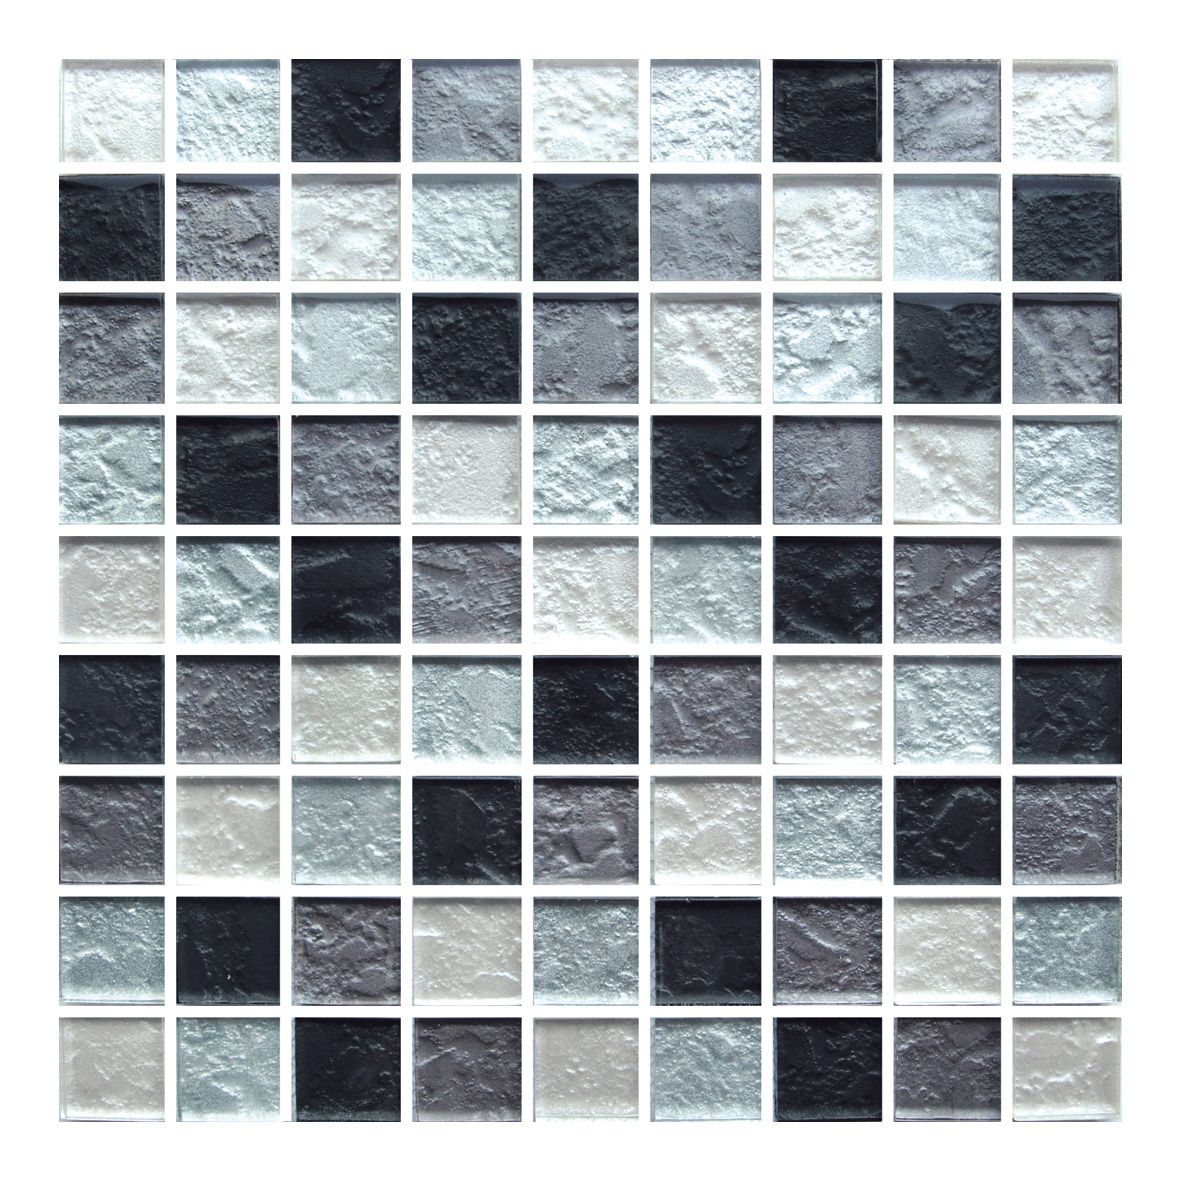 gemini mosaics zaria dimante glass mosaic kitchen and bathroom dcor tiles gemini tiles - Matchstick Tile Garden Decoration